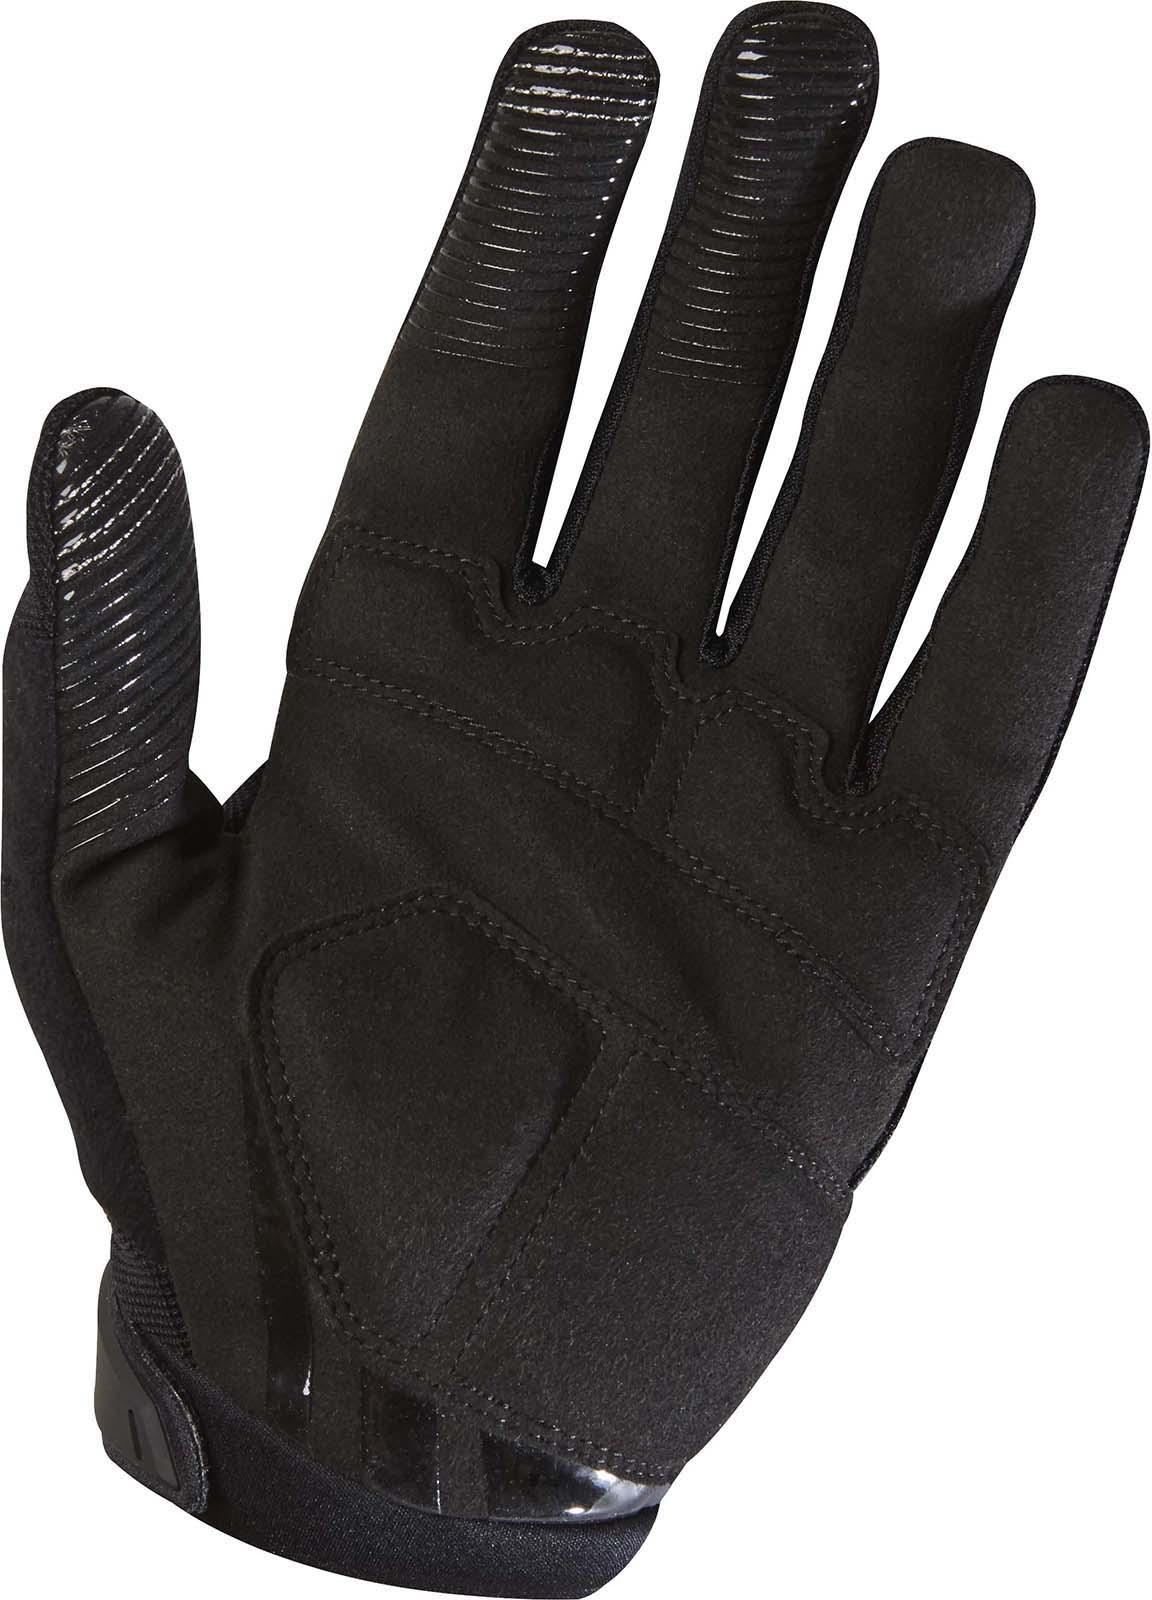 Fox Head Ranger Gel Outdoor Racing Mountain Bike Bmx Cycling Gloves